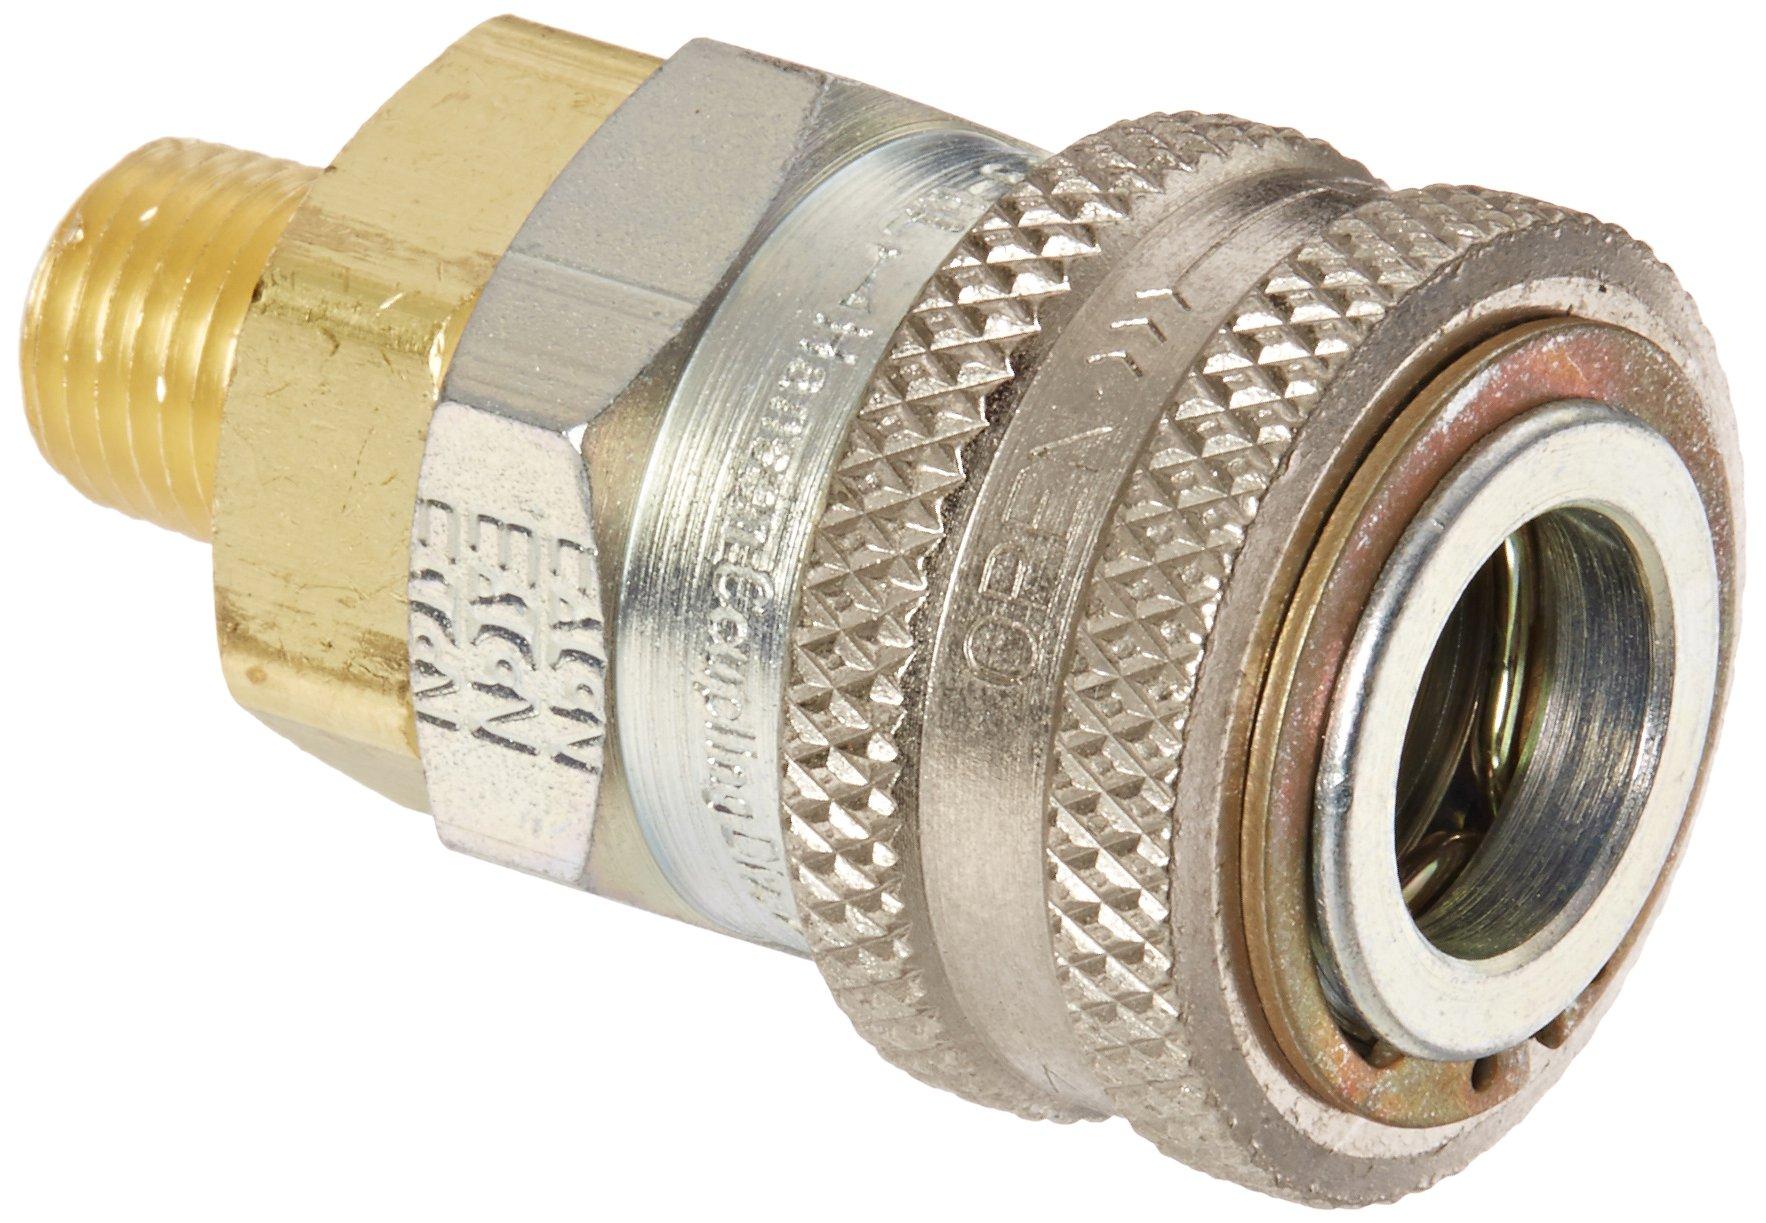 Eaton Hansen 3R15 Steel Ring Lock Quick Connect Pneumatic Fitting, Socket, 1/4''-18 NPTF Male, 1/4'' Port Size, 3/8'' Body